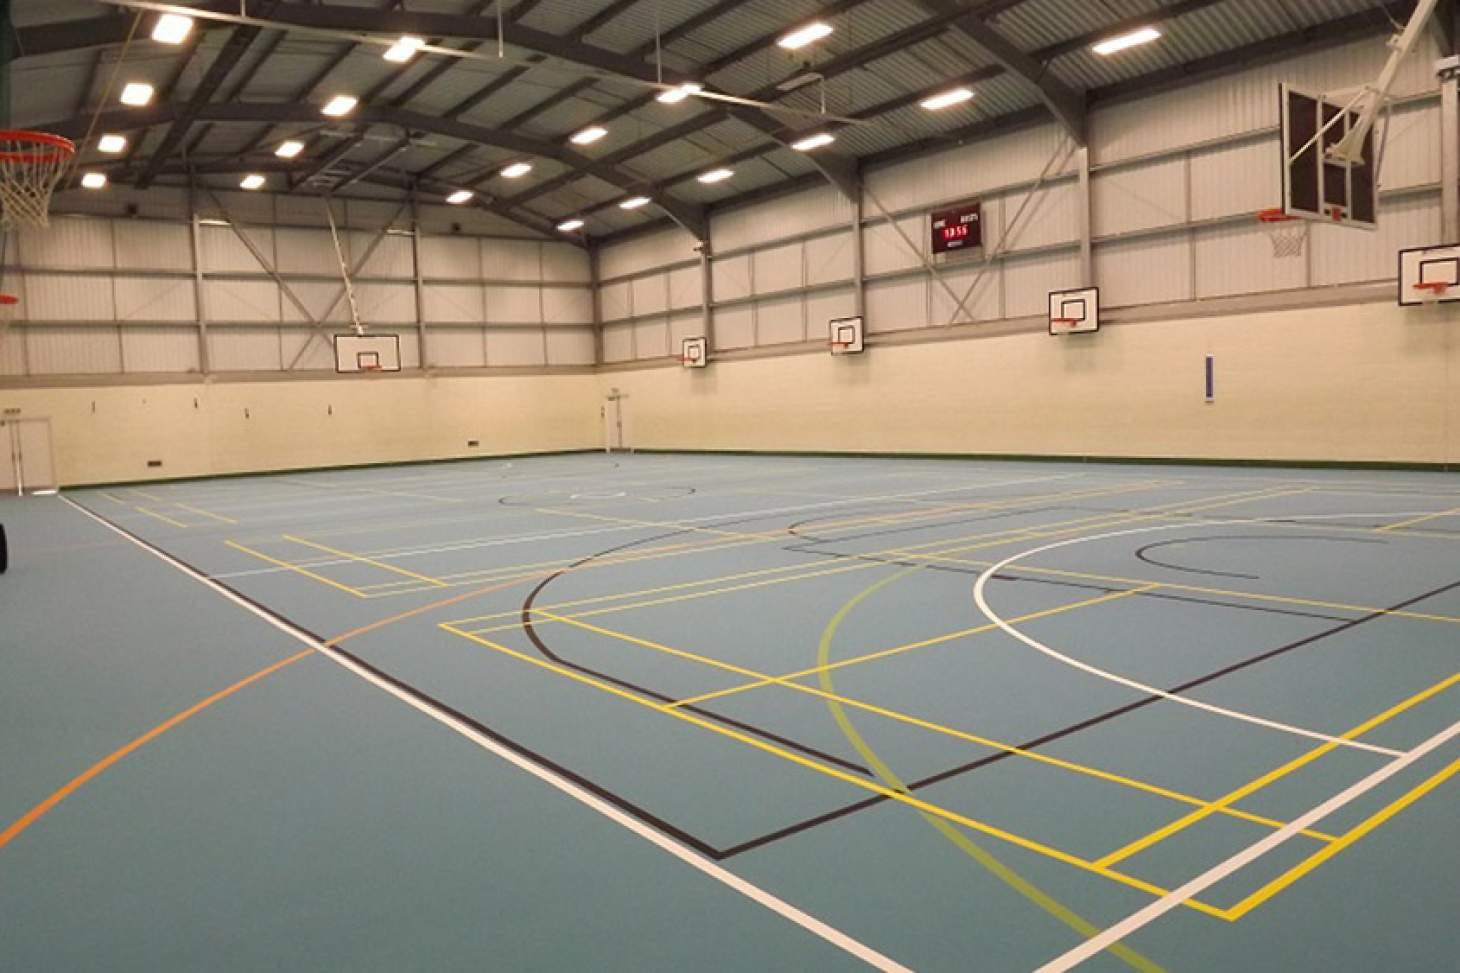 Dr Challoner's High School Indoor basketball court